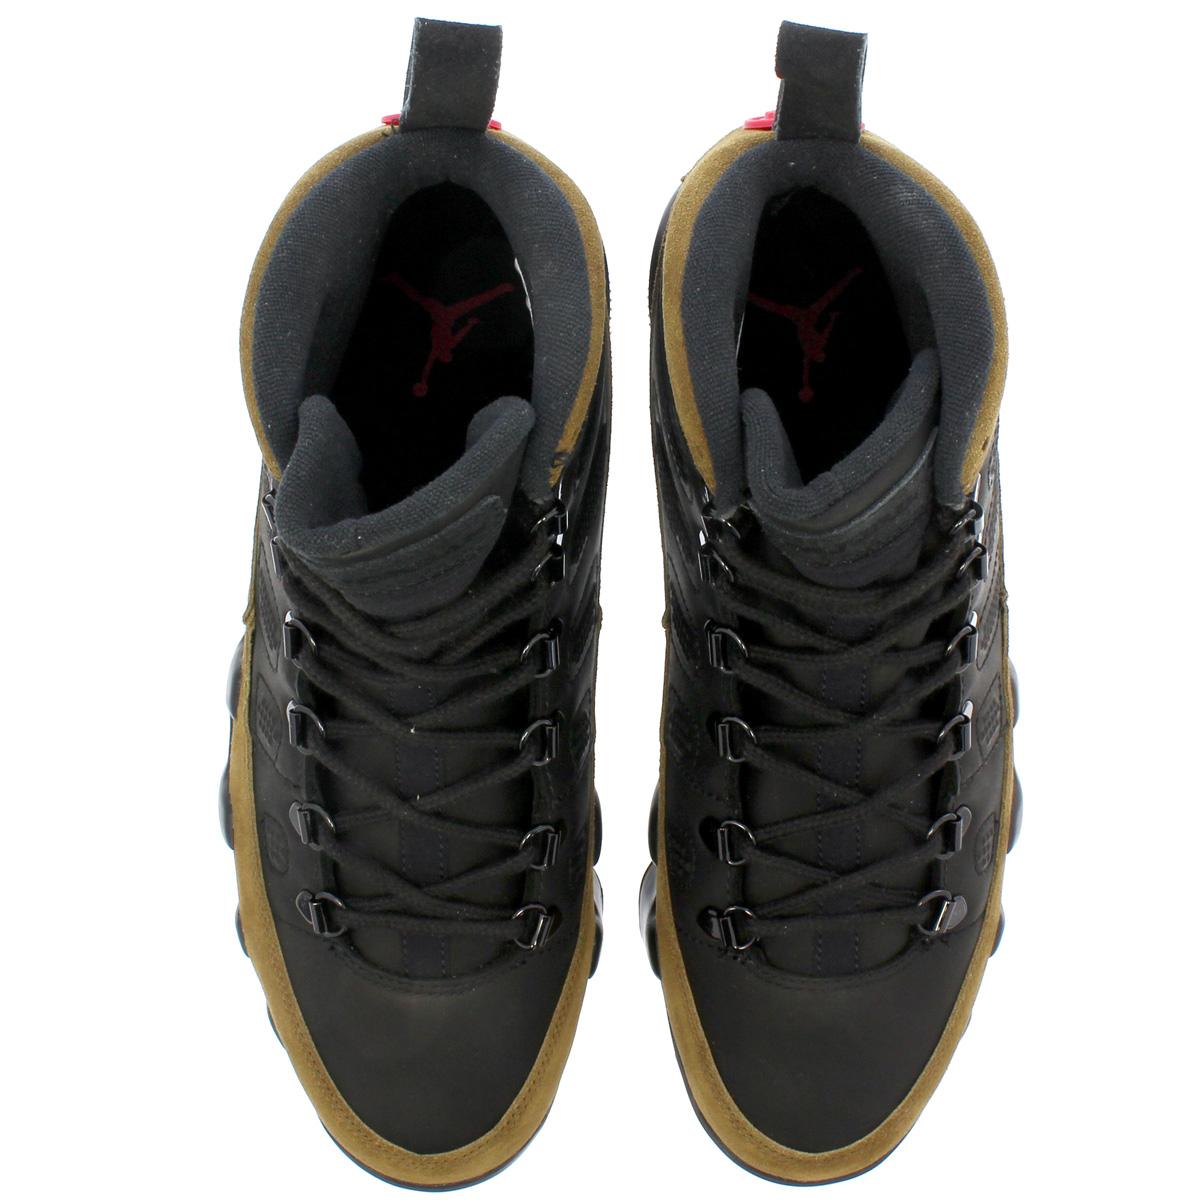 bb145d09dcf5 NIKE AIR JORDAN 9 RETRO NRG Nike air Jordan 9 nostalgic NRG BLACK TRUE RED LIGHT  OLIVE